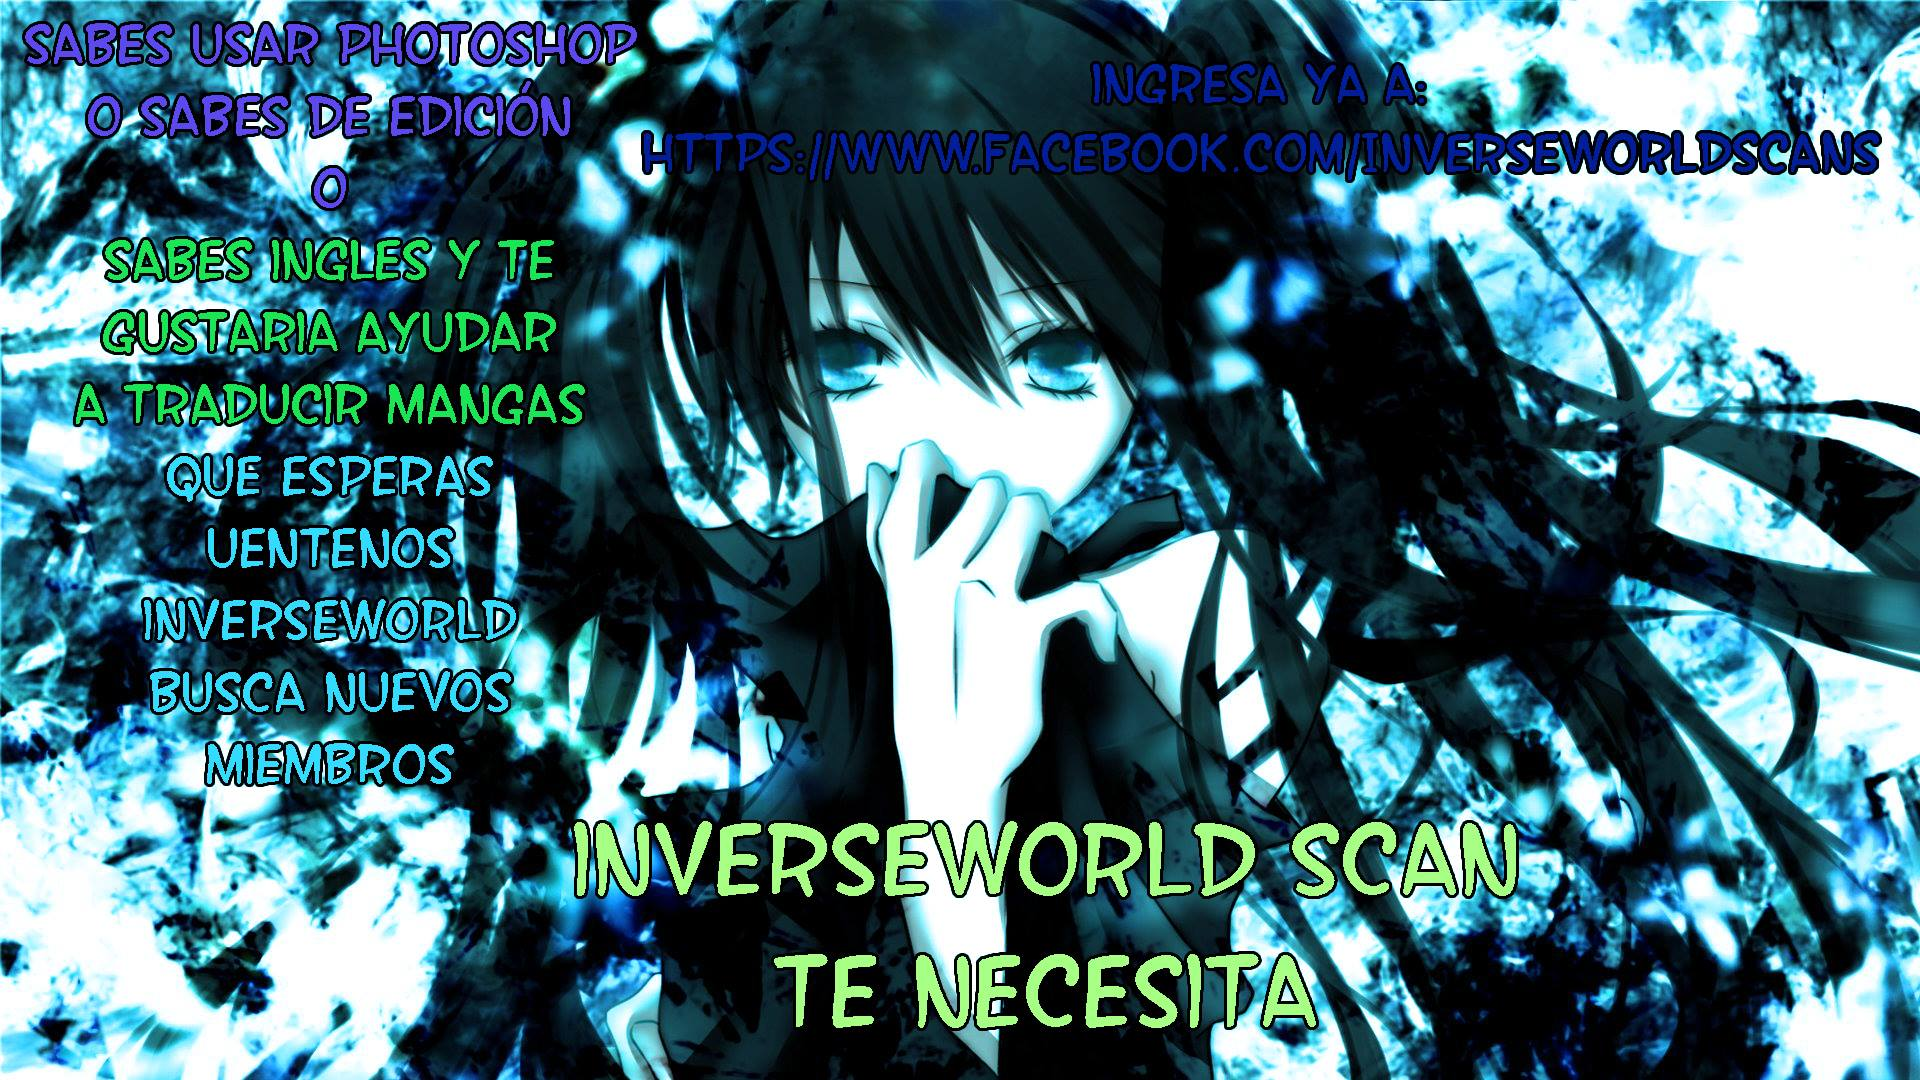 https://c5.mangatag.com/es_manga/18/16210/415322/1d7944598827fac015ee561af34dd0b4.jpg Page 1